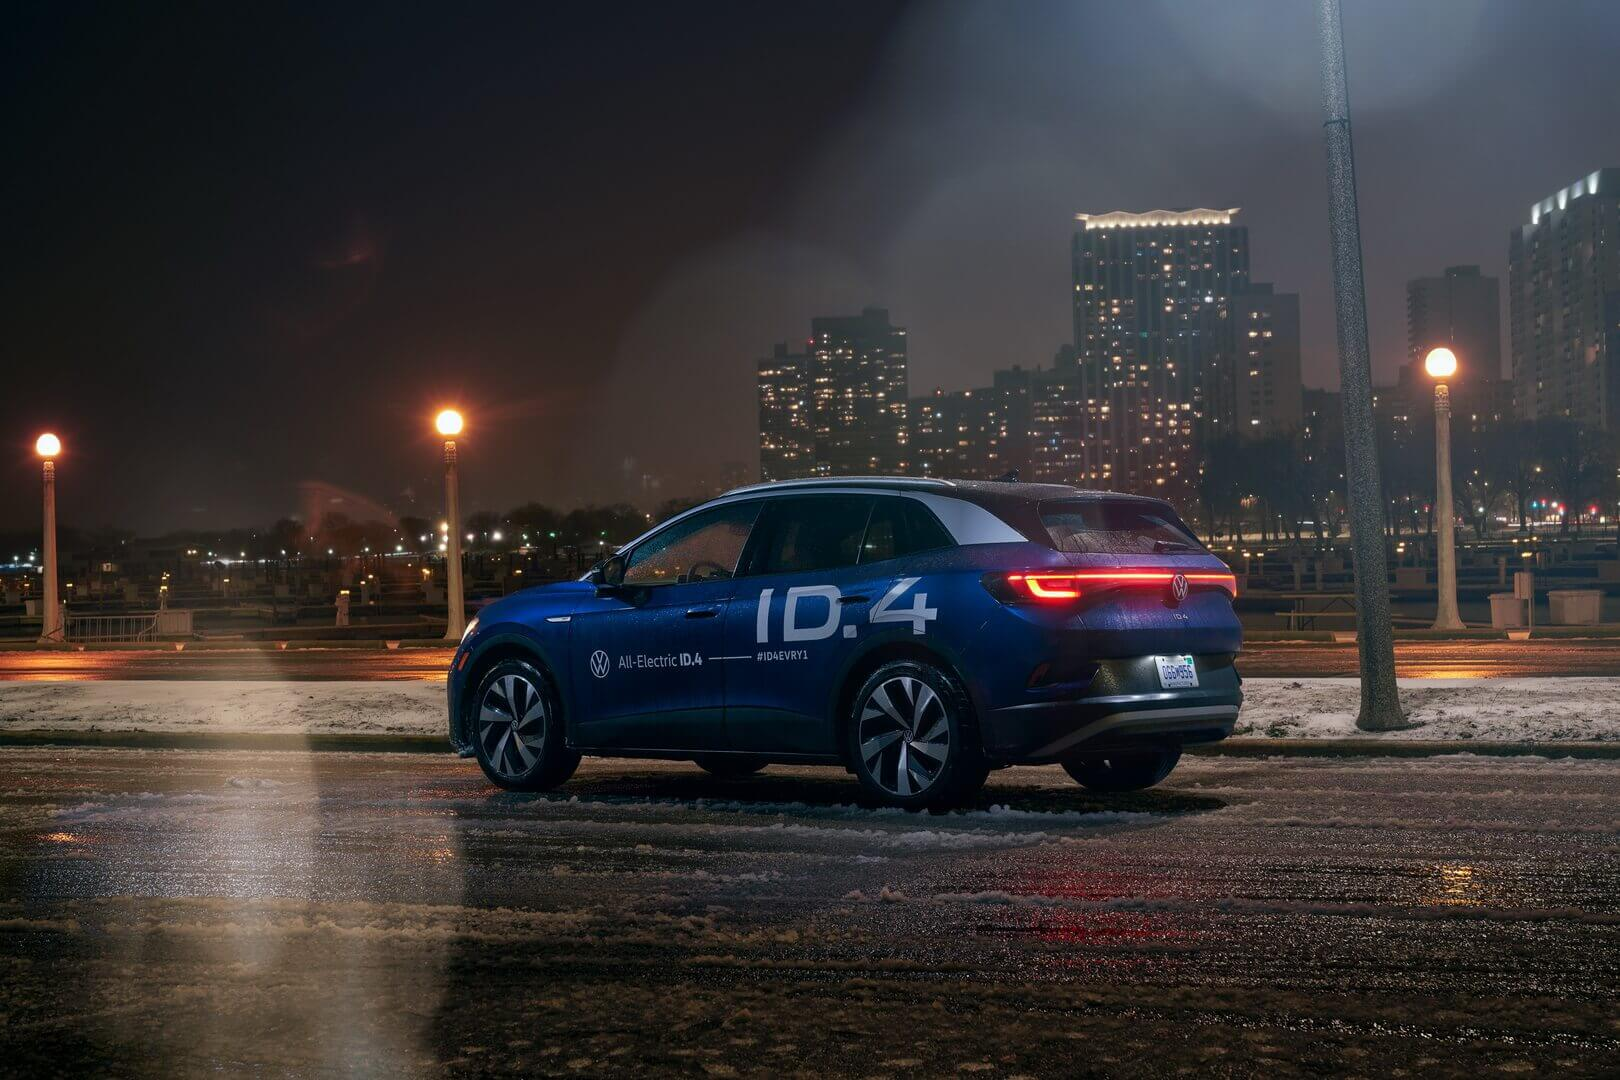 VW ID.4 проехал 10780 км от побережья к побережью в США за 18 дней